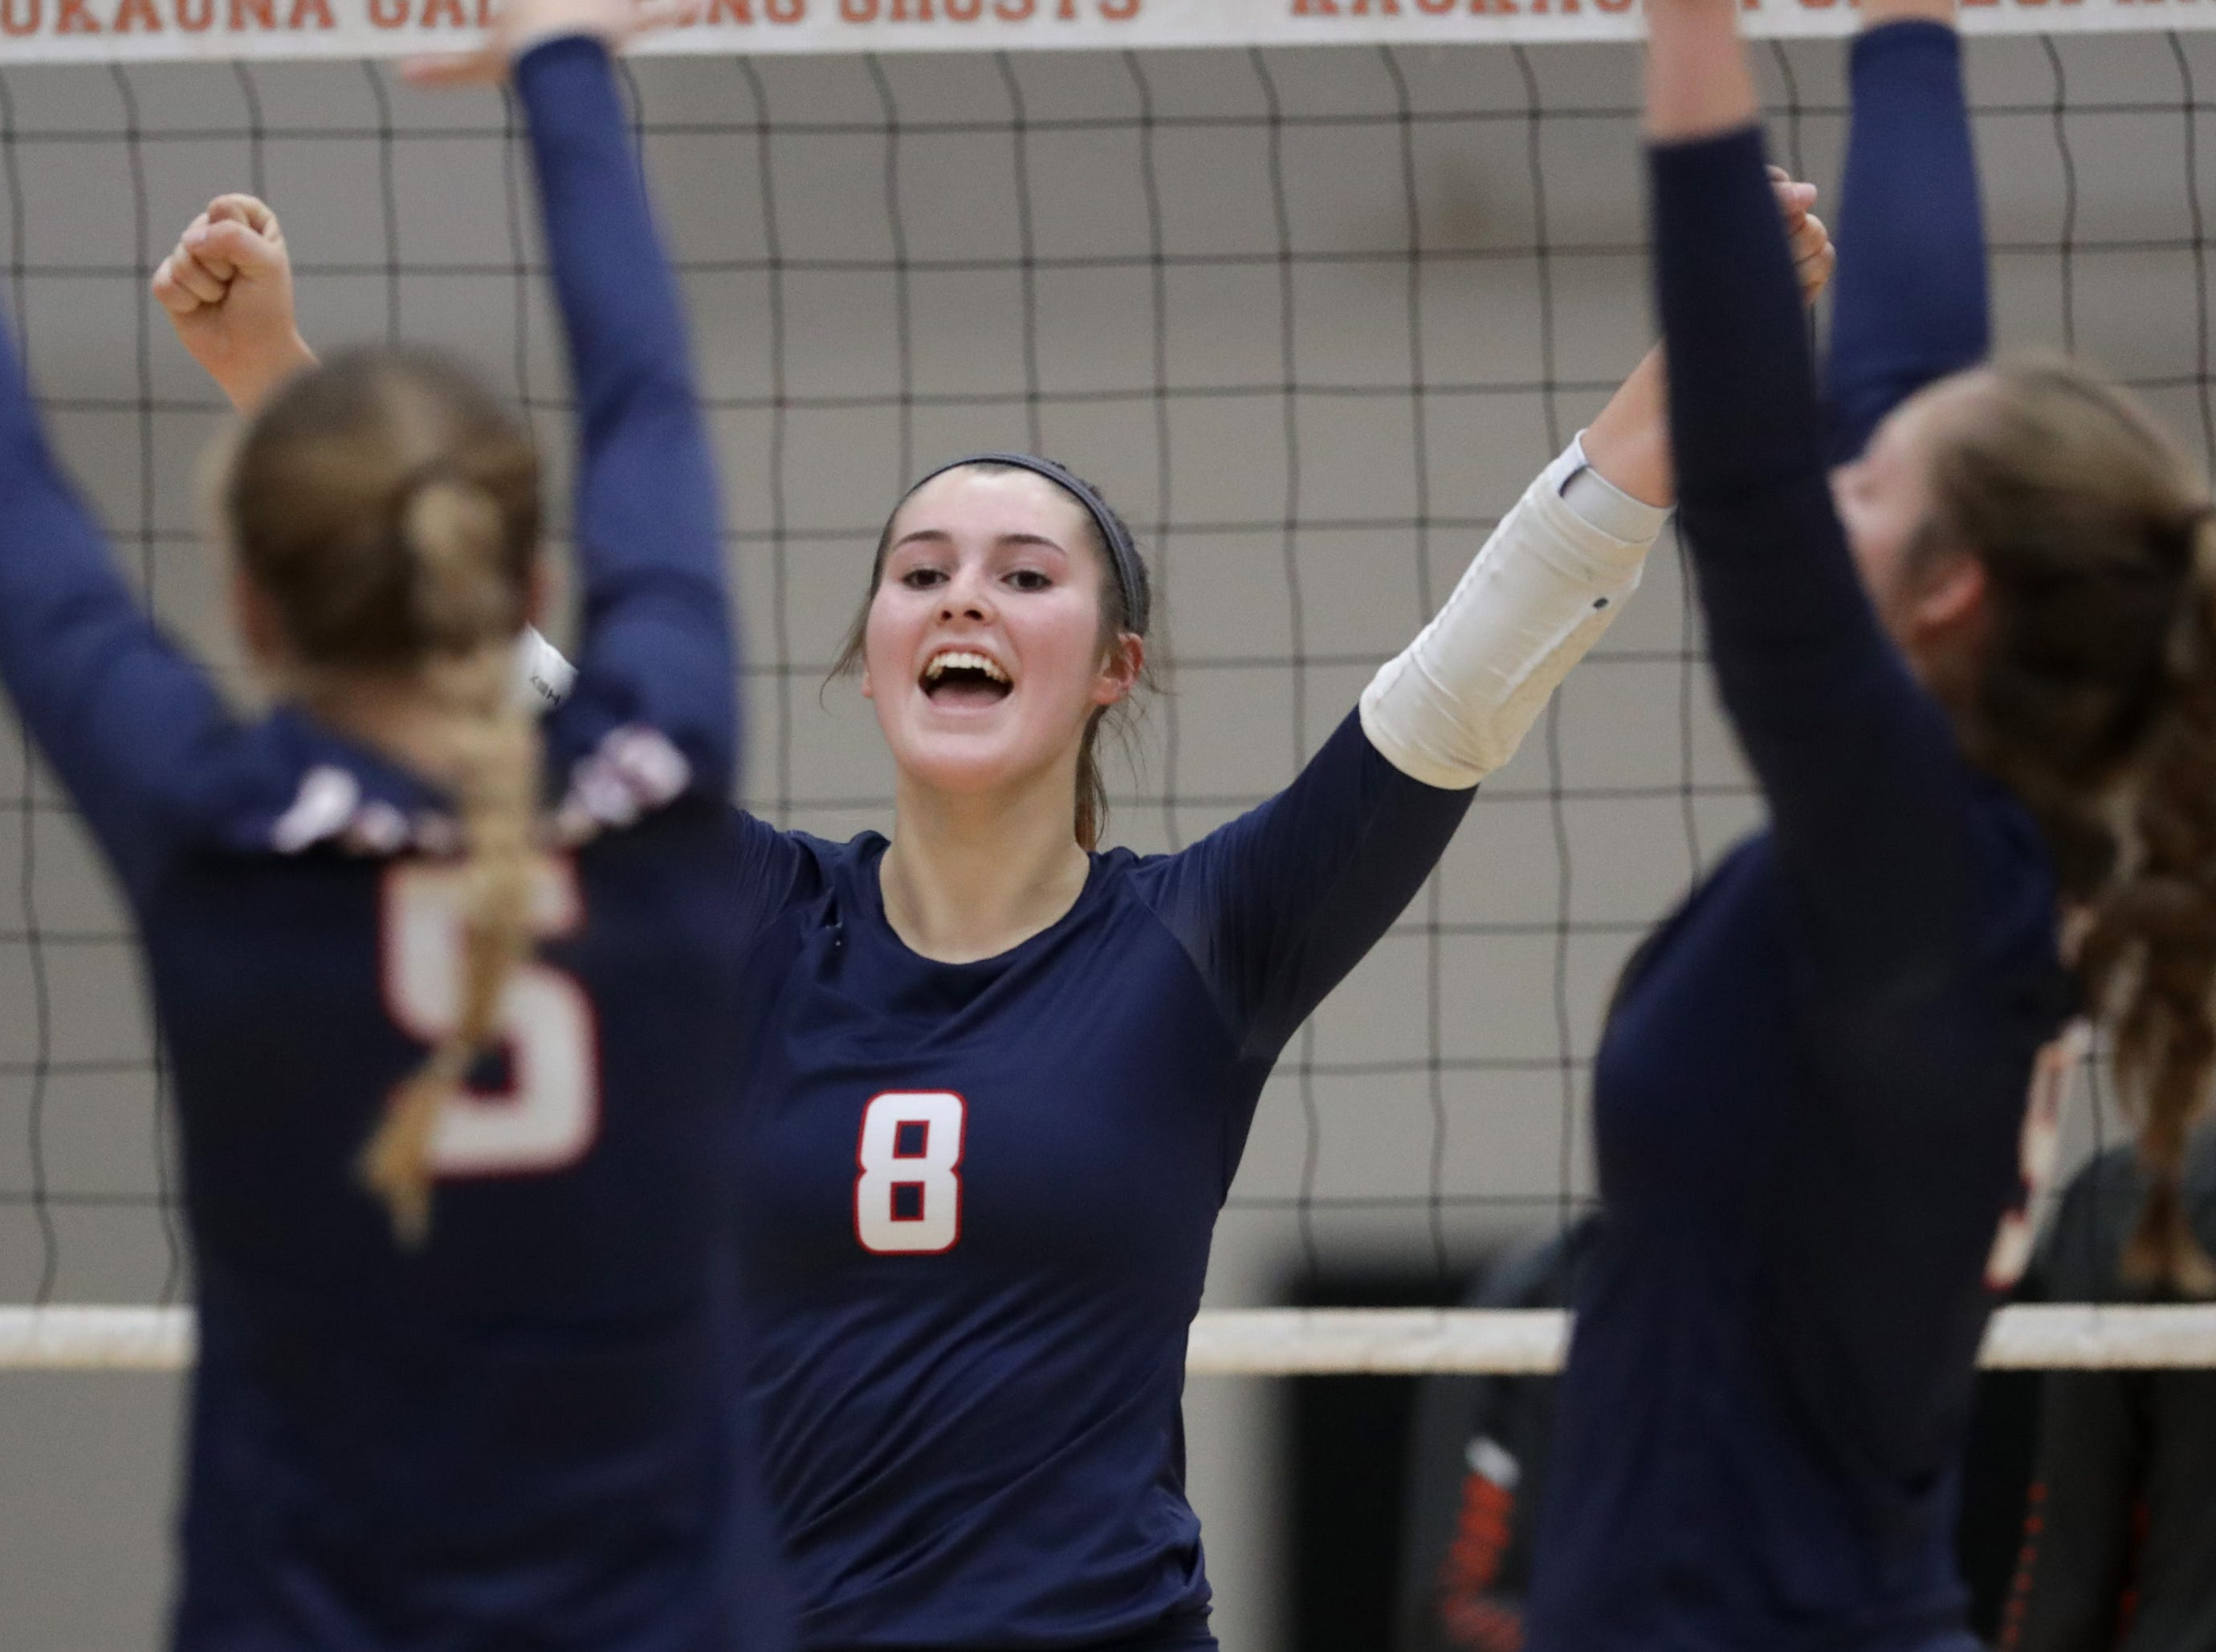 Appleton East High School's #8 Tiffany Paalman against Kaukauna High School during their girls volleyball game on Thursday, October 11, 2018, in Kaukauna, Wis. Wm. Glasheen/USA TODAY NETWORK-Wisconsin.